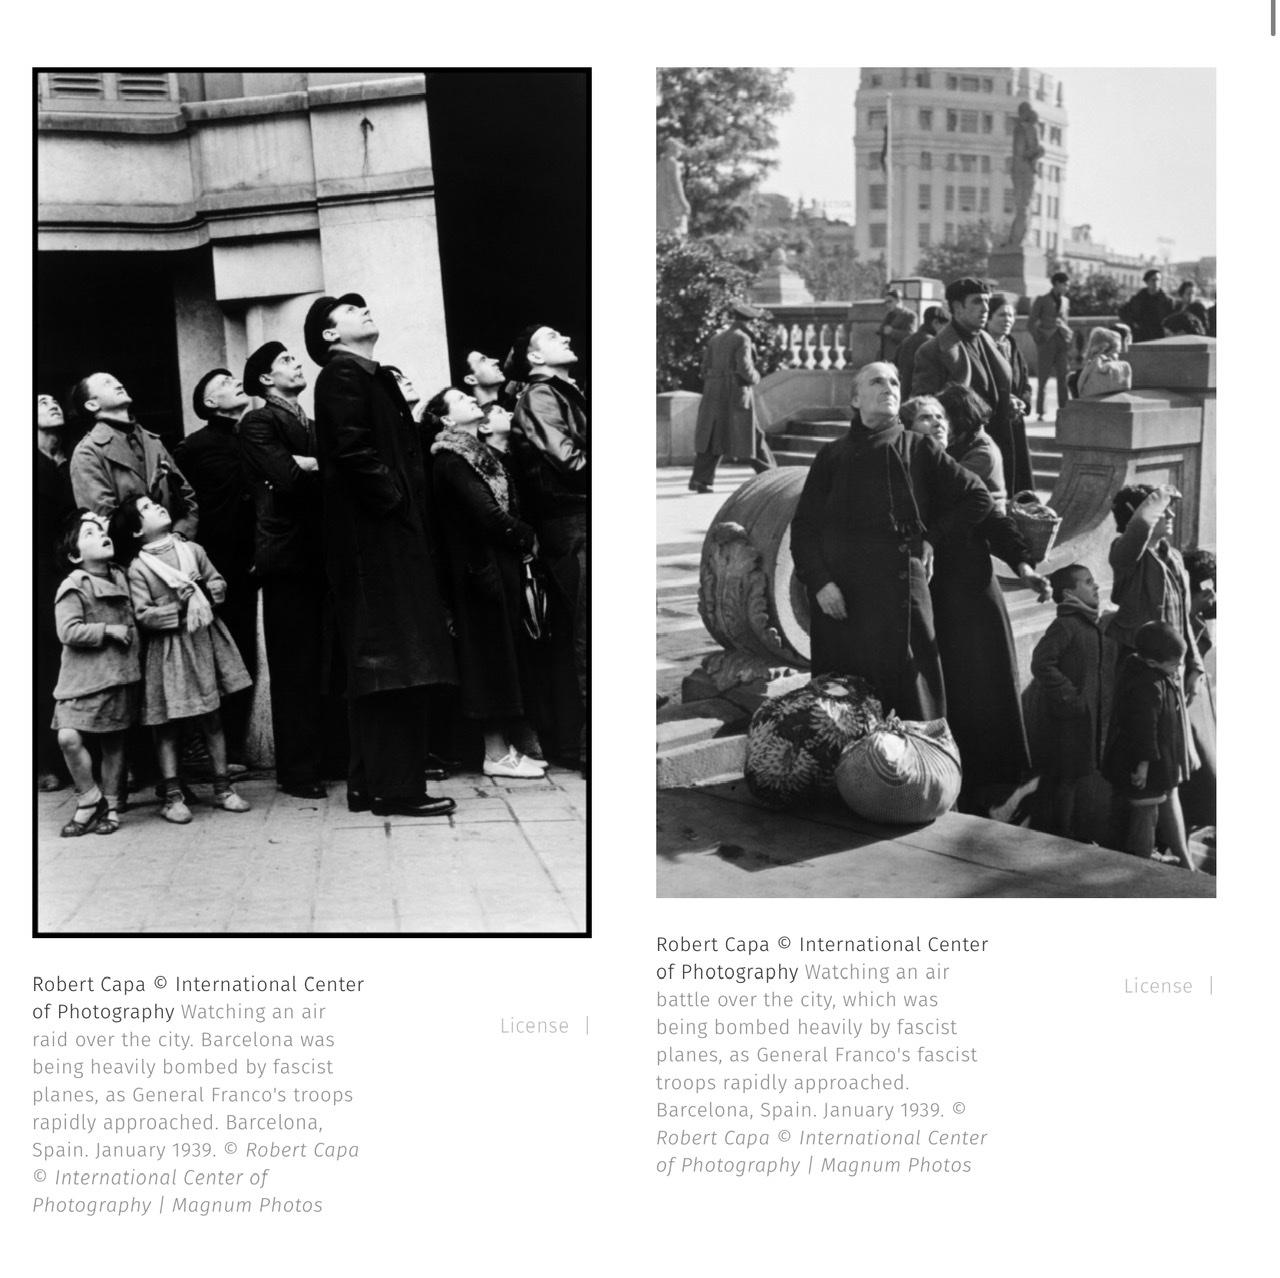 Robert Capa Photography Composition Studies